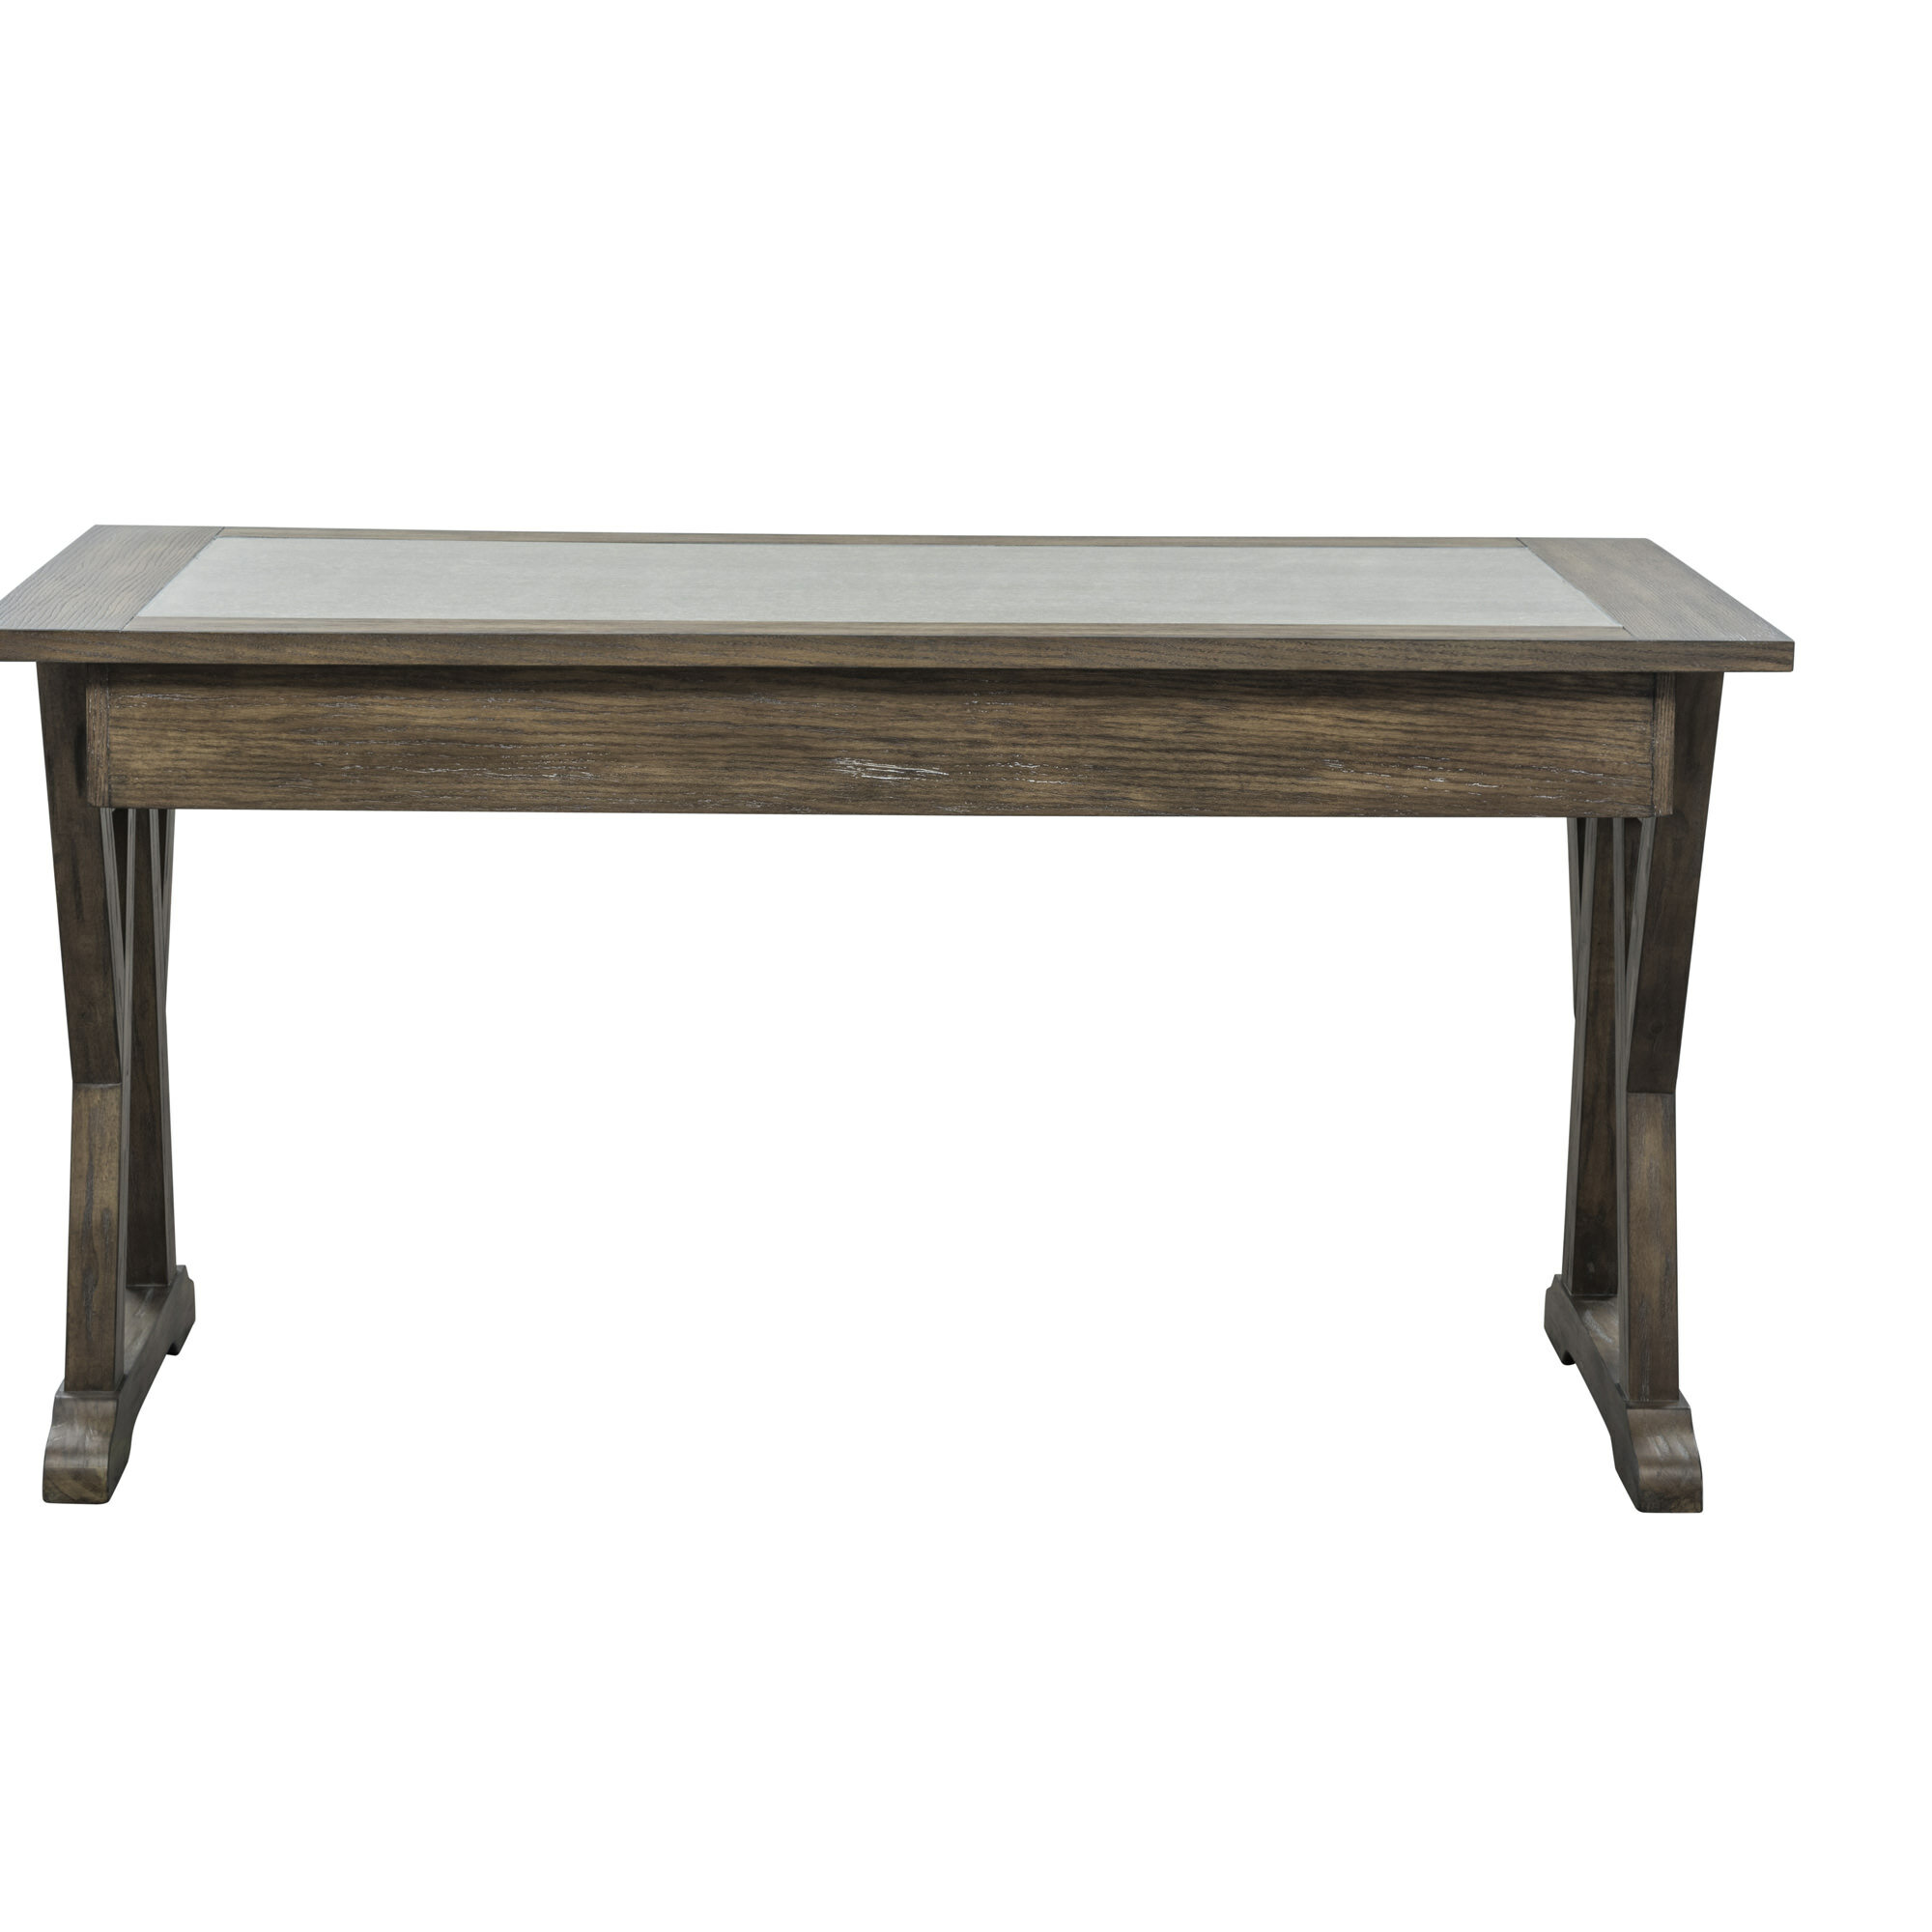 Remarkable Hutto Solid Wood Desk Download Free Architecture Designs Scobabritishbridgeorg